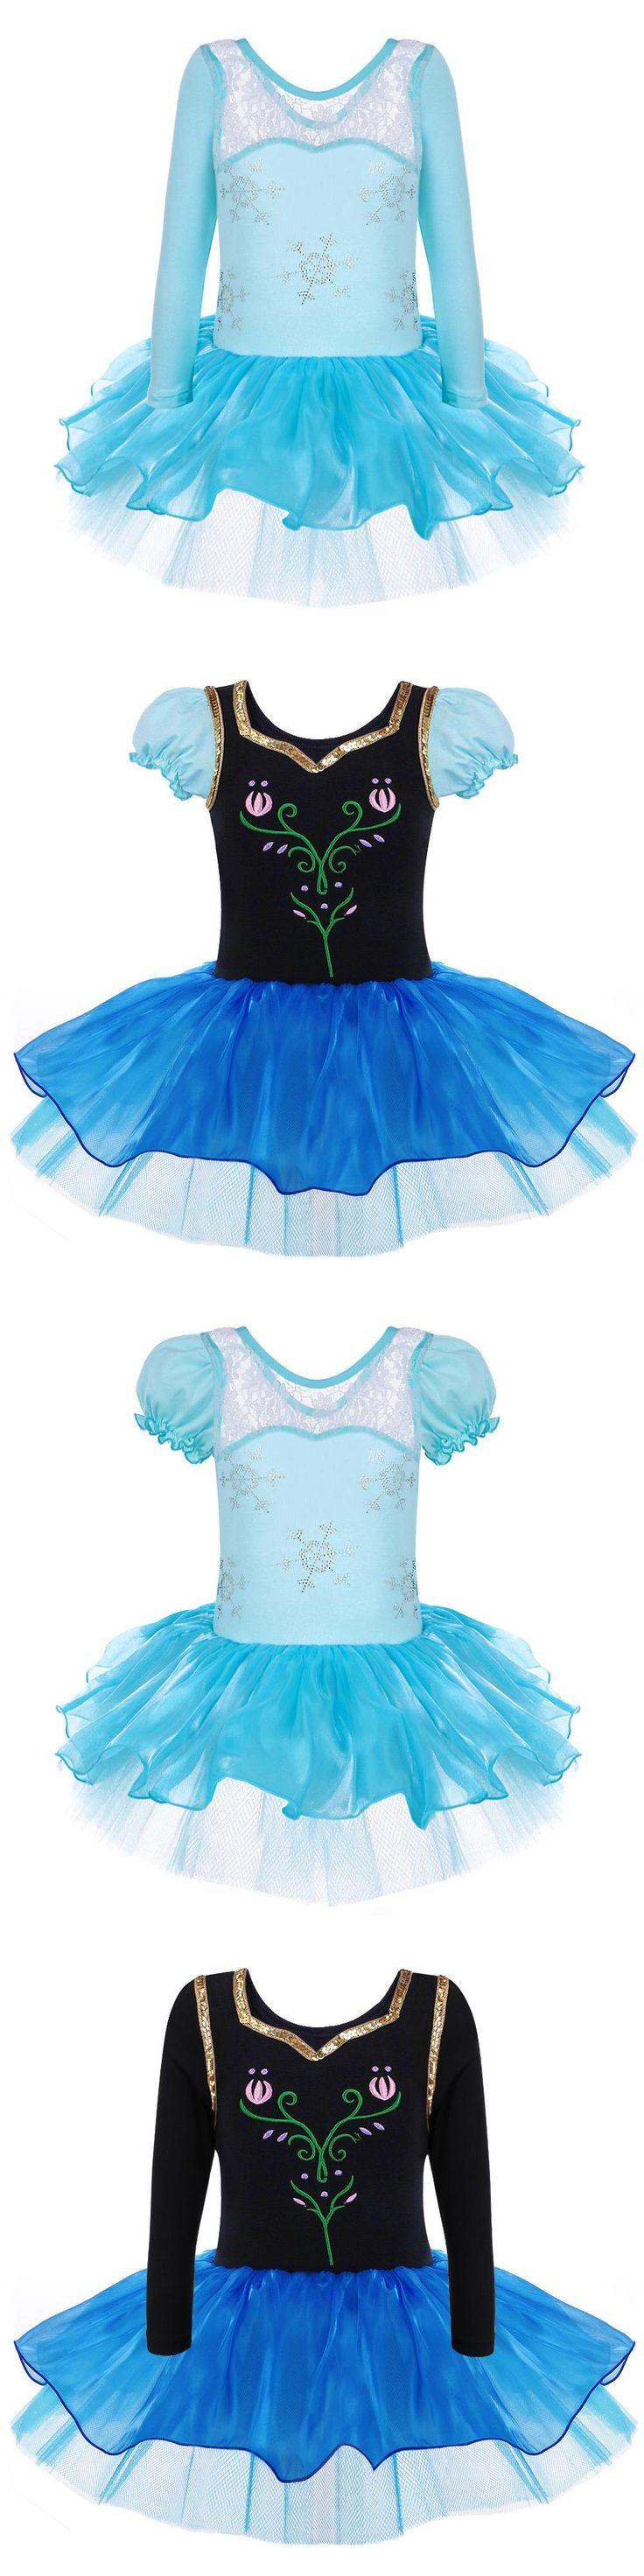 Anna Princess Girls Elsa Snowflake Ballet Dress Leotard Short/Long Sleeve Dancewear for 2-8Y Ballet Tutu Party Dress Dance Dress